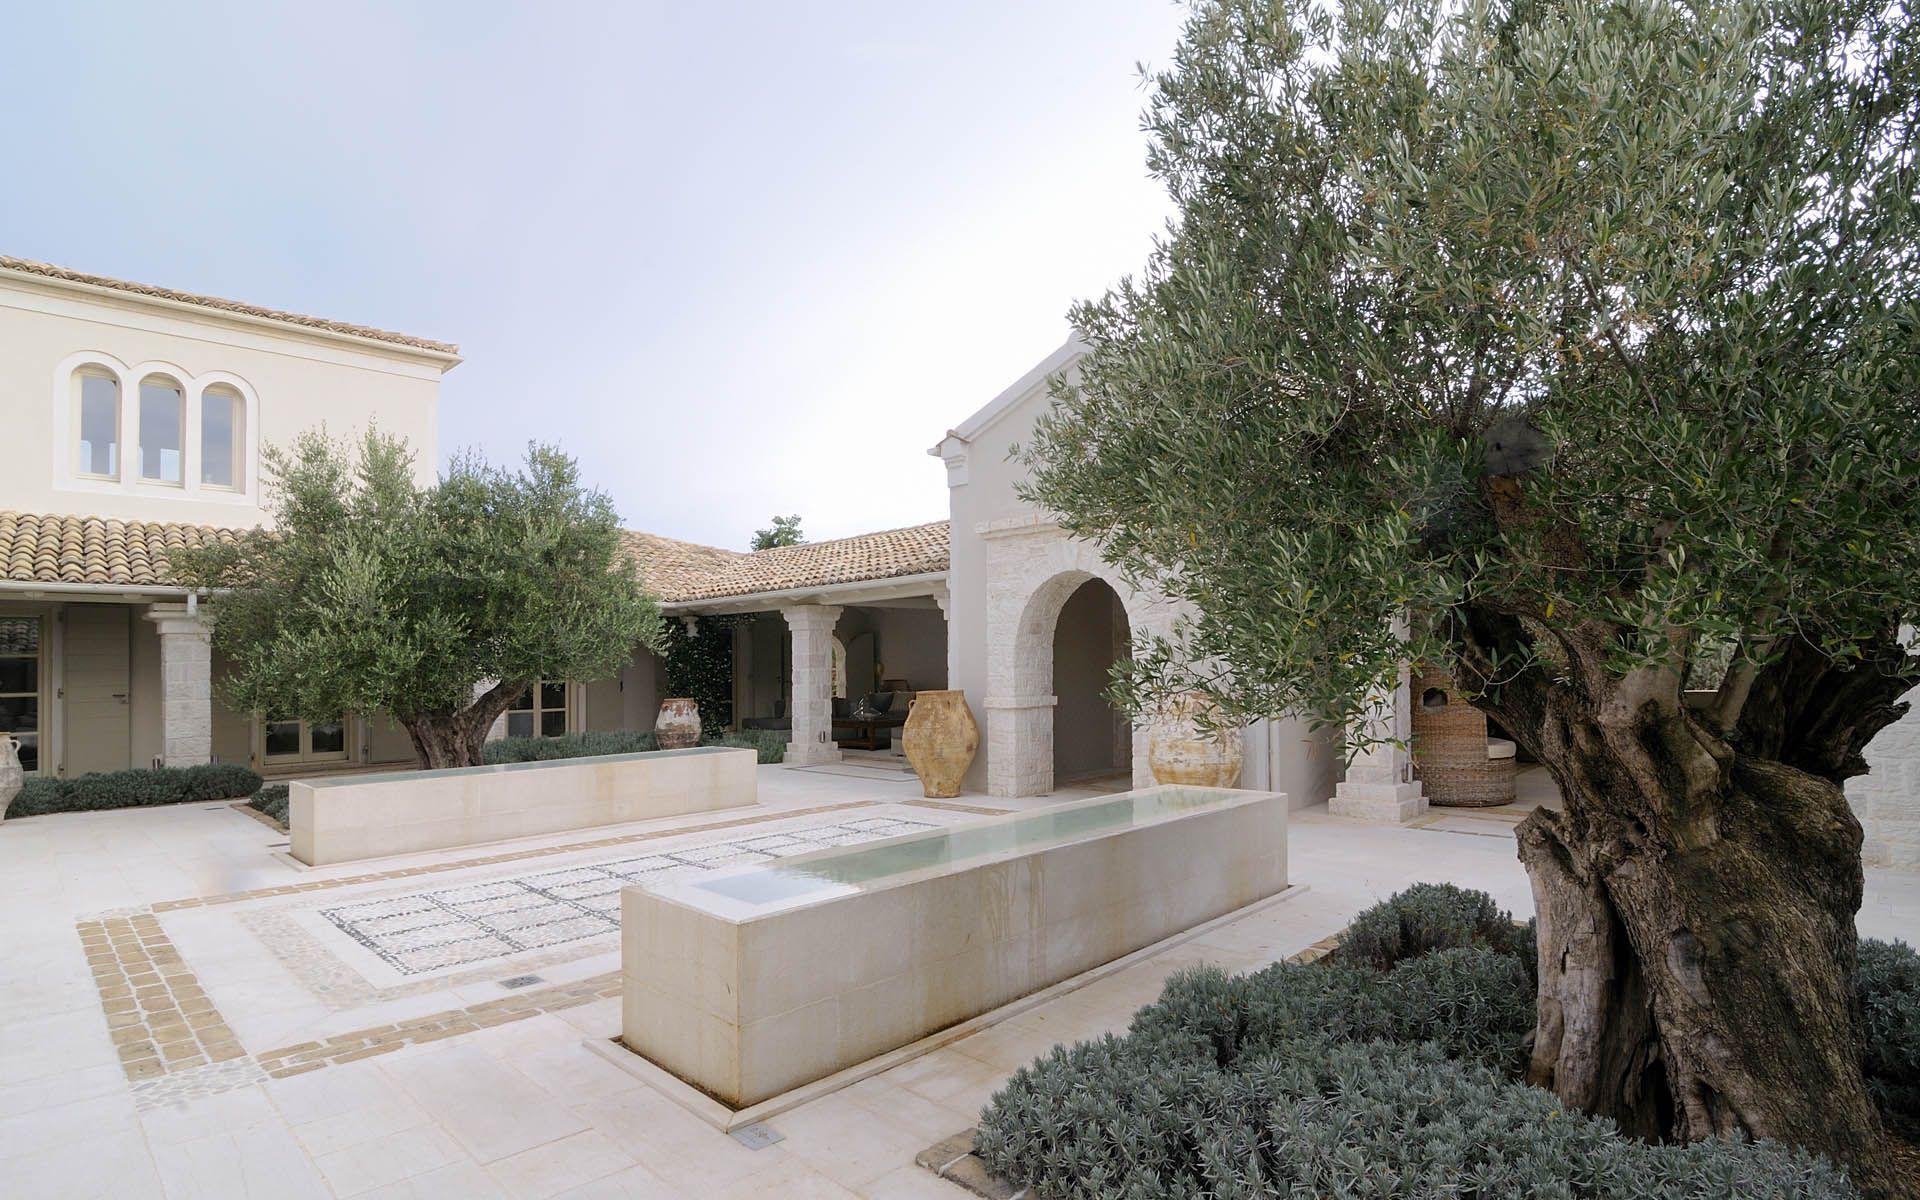 Luxury Villa, Cassiopeia House, Corfu, Greece, Europe